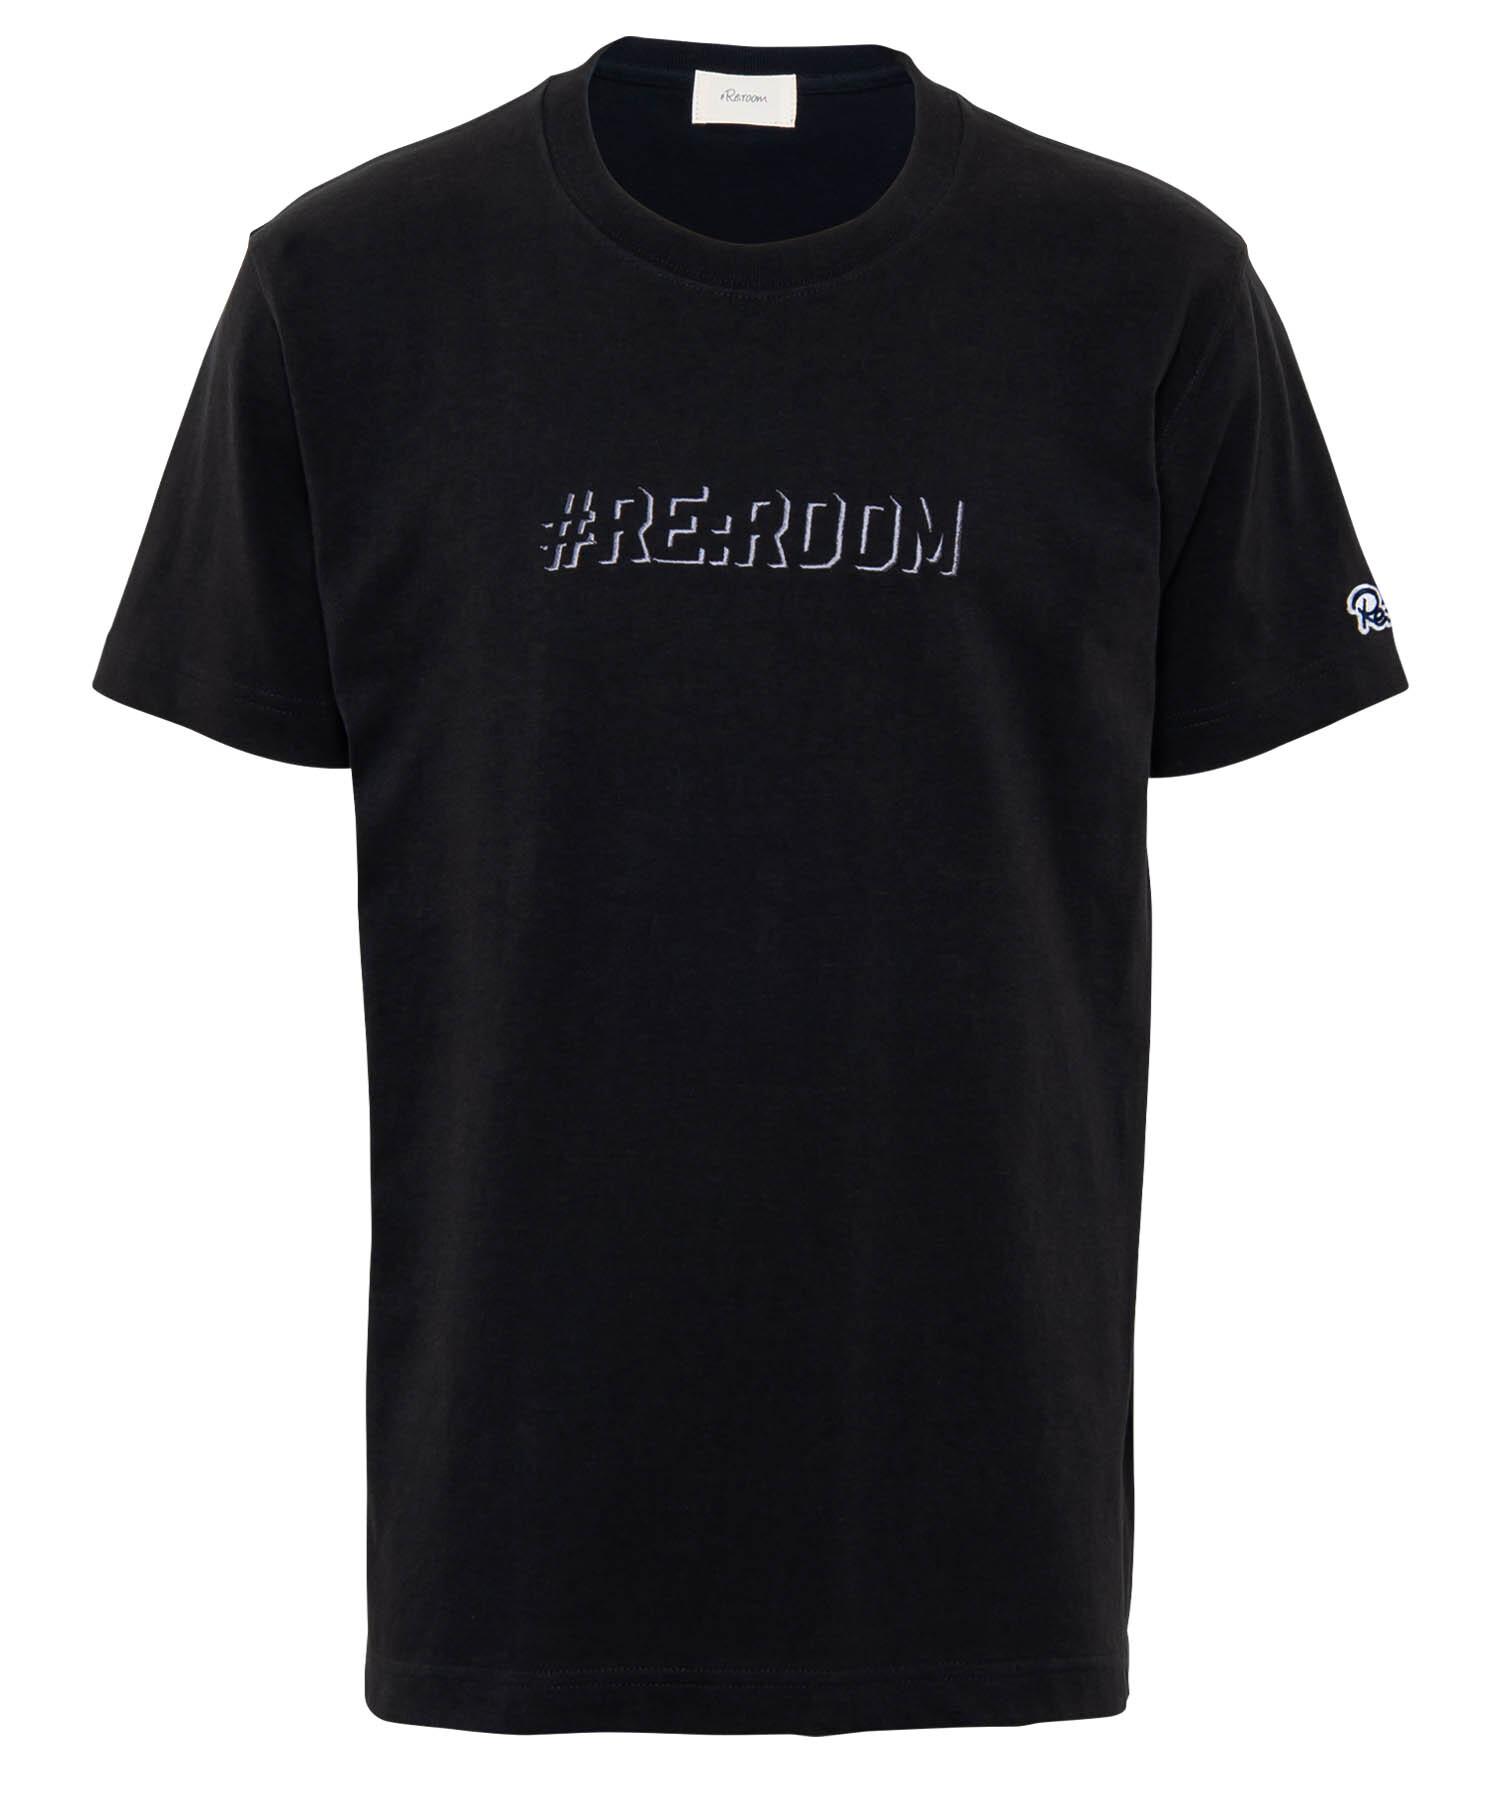 EMBROIDERY SHADOW LOGO T-shirt[REC396]